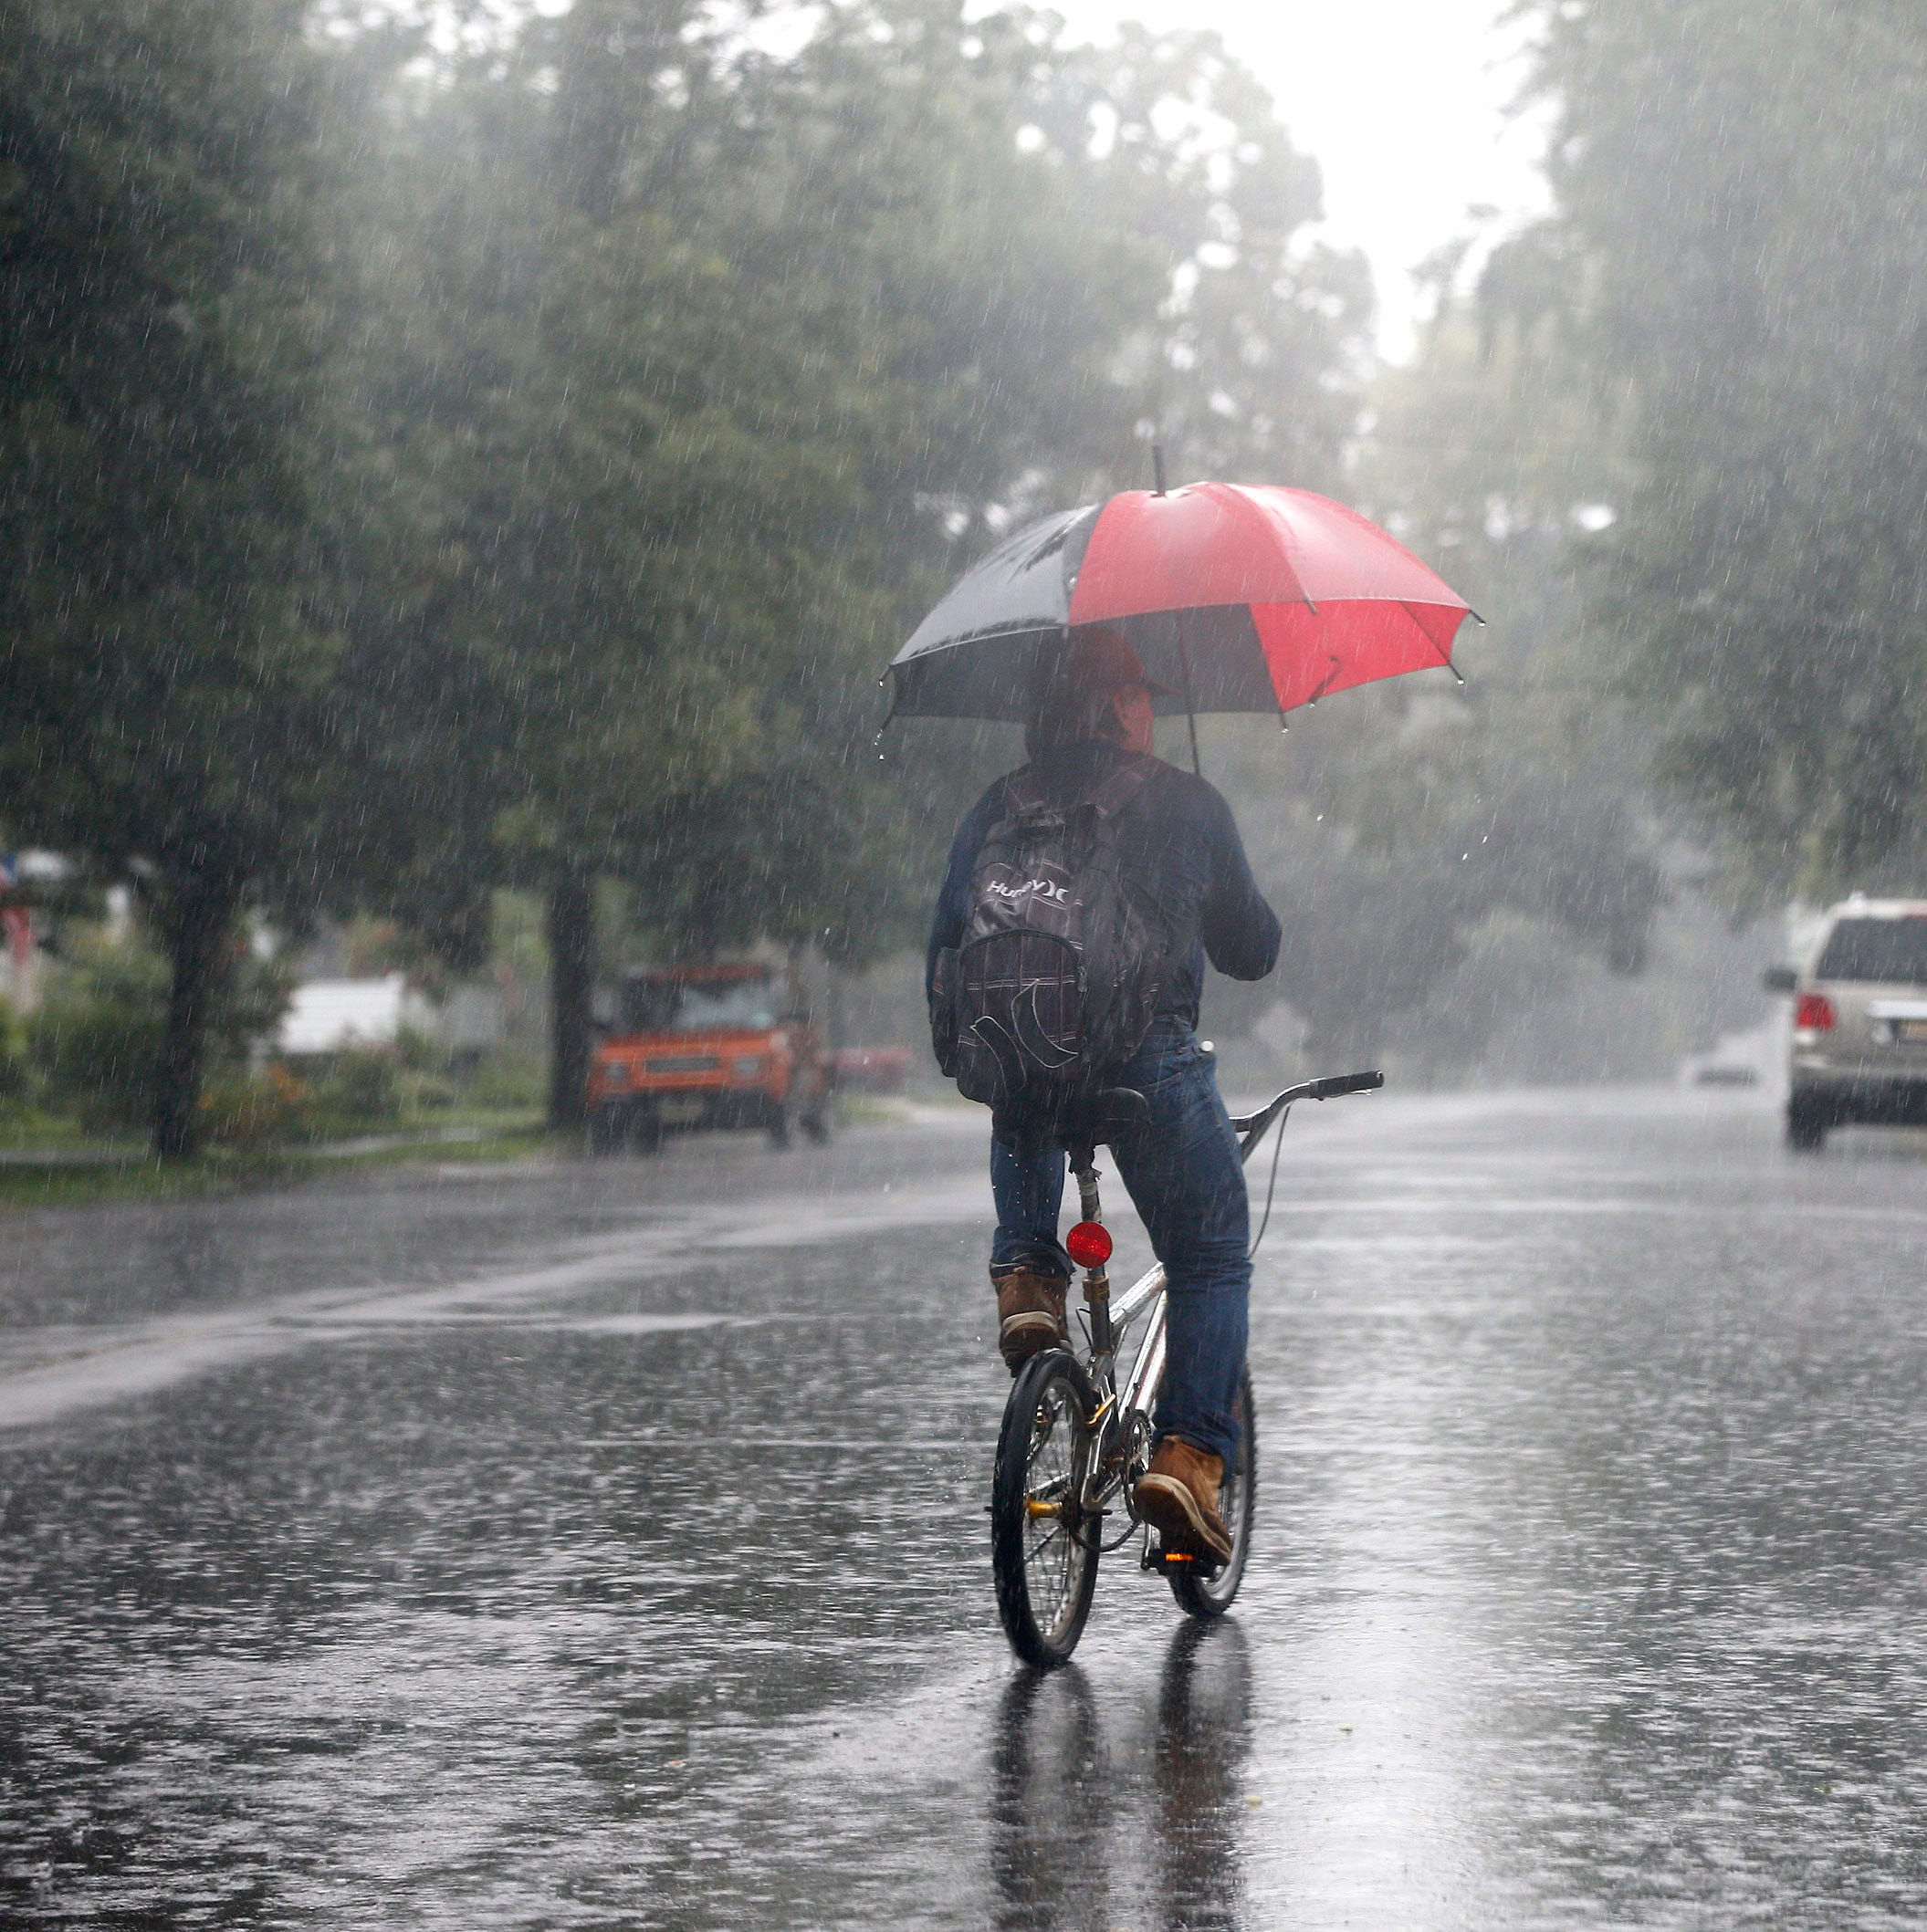 NJ weather: 2018 has been tremendously wet